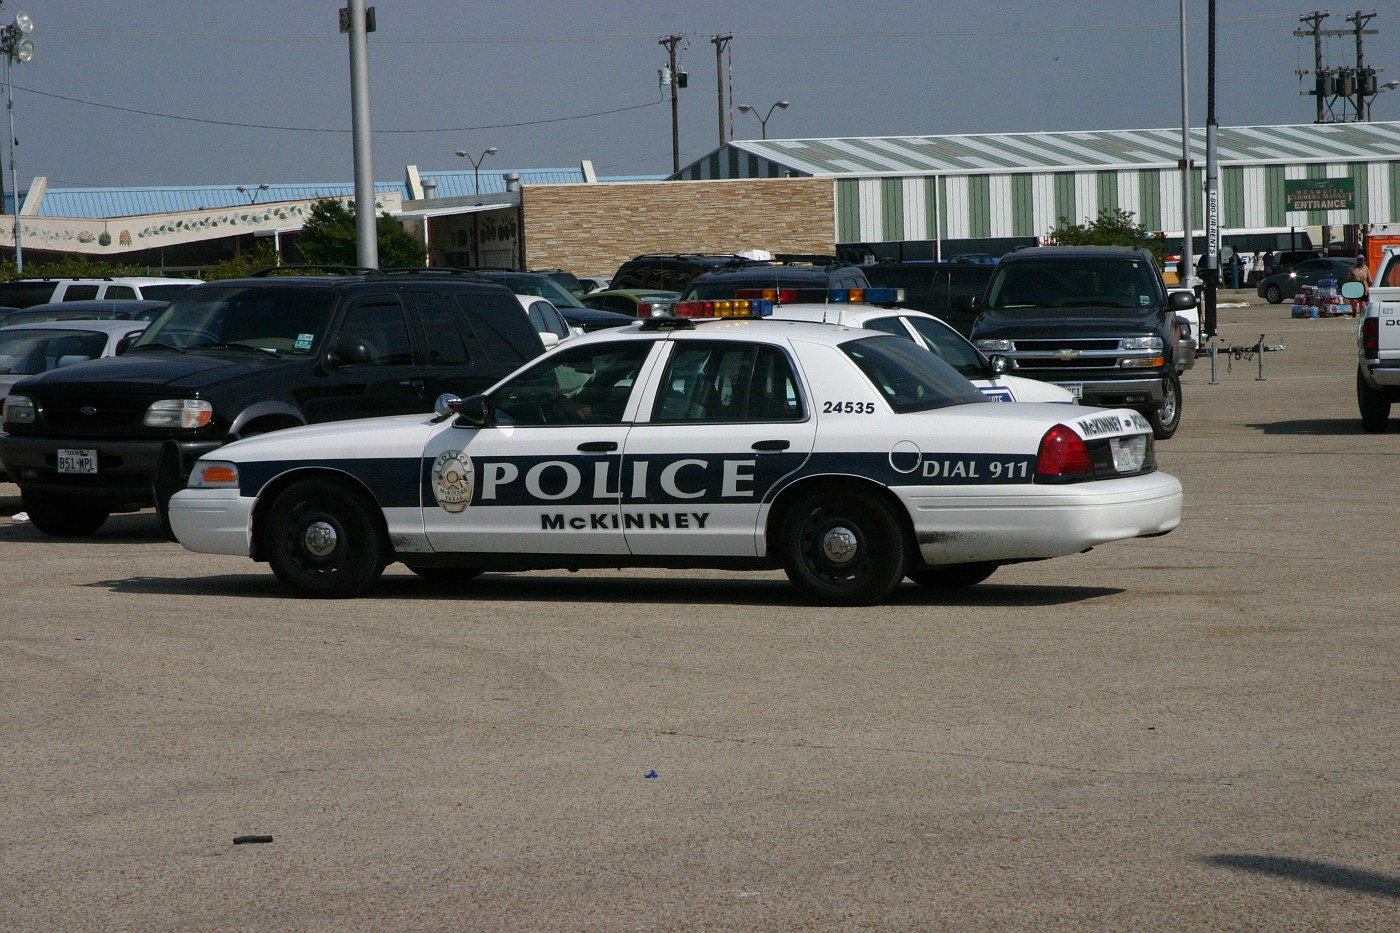 McKinney Police